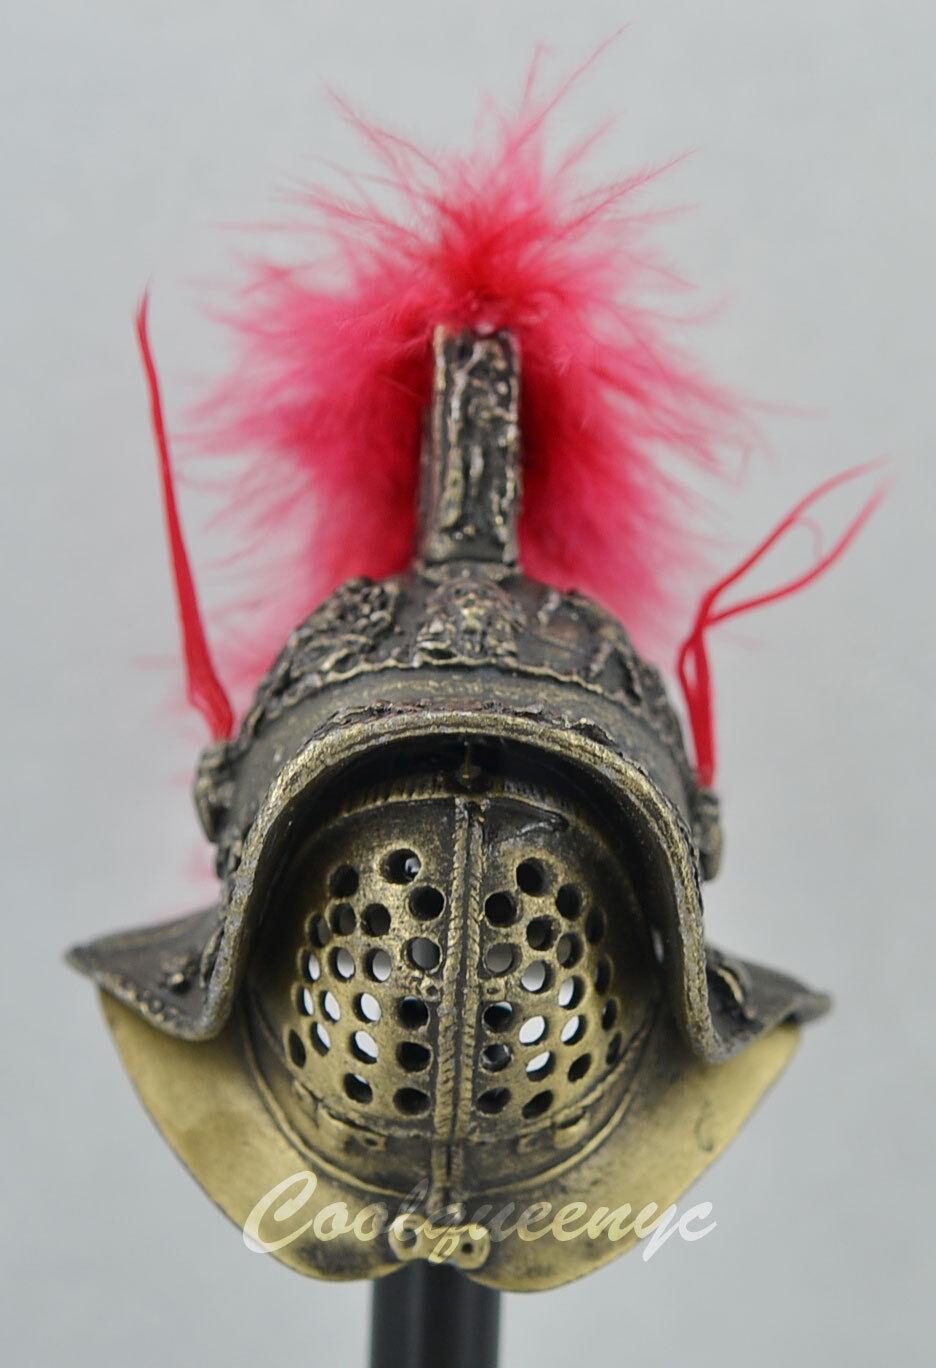 Kaustic plastik, 1   6 - skala kp0004-2 gladiatoren - schule von pompeji myrmillo helm